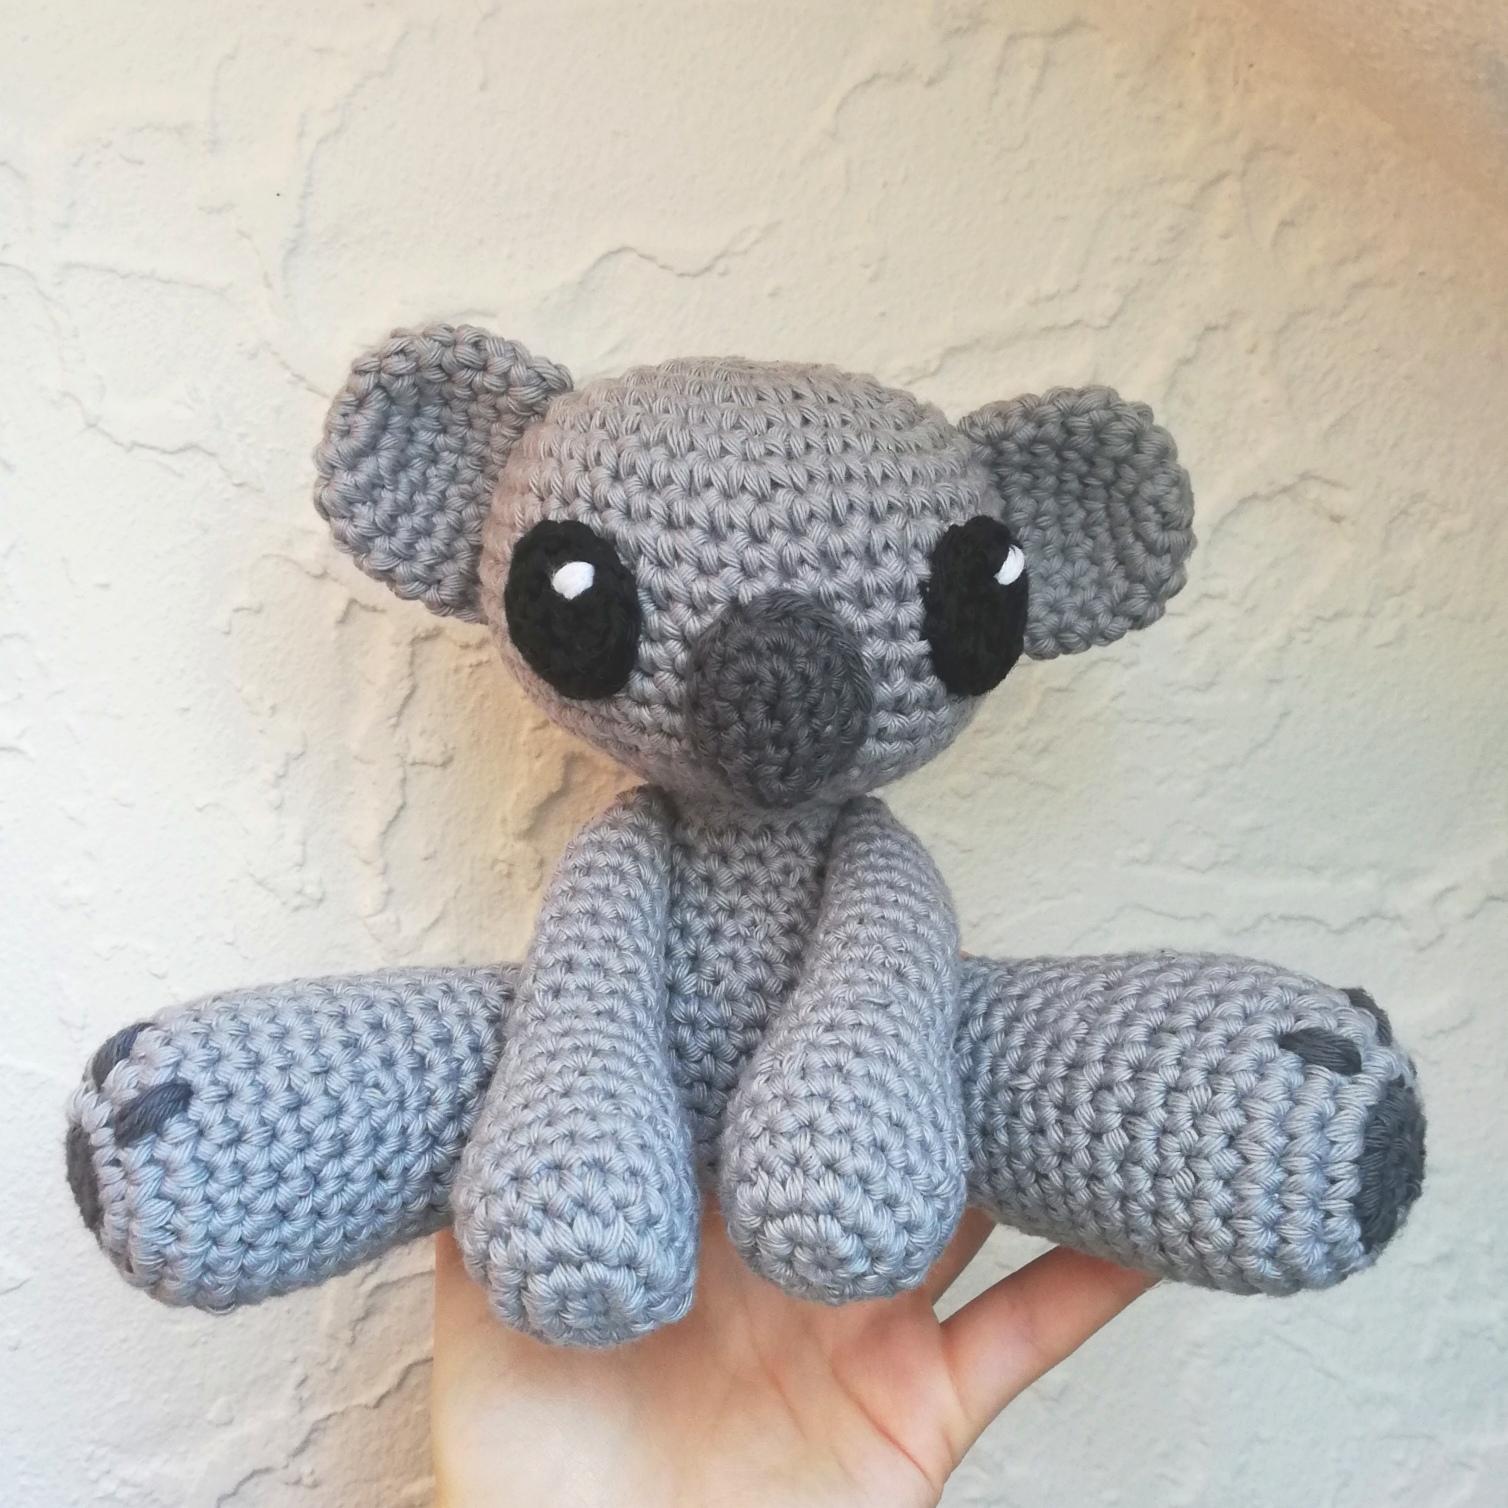 Amigurumi Koala Free Crochet Pattern | 1508x1508